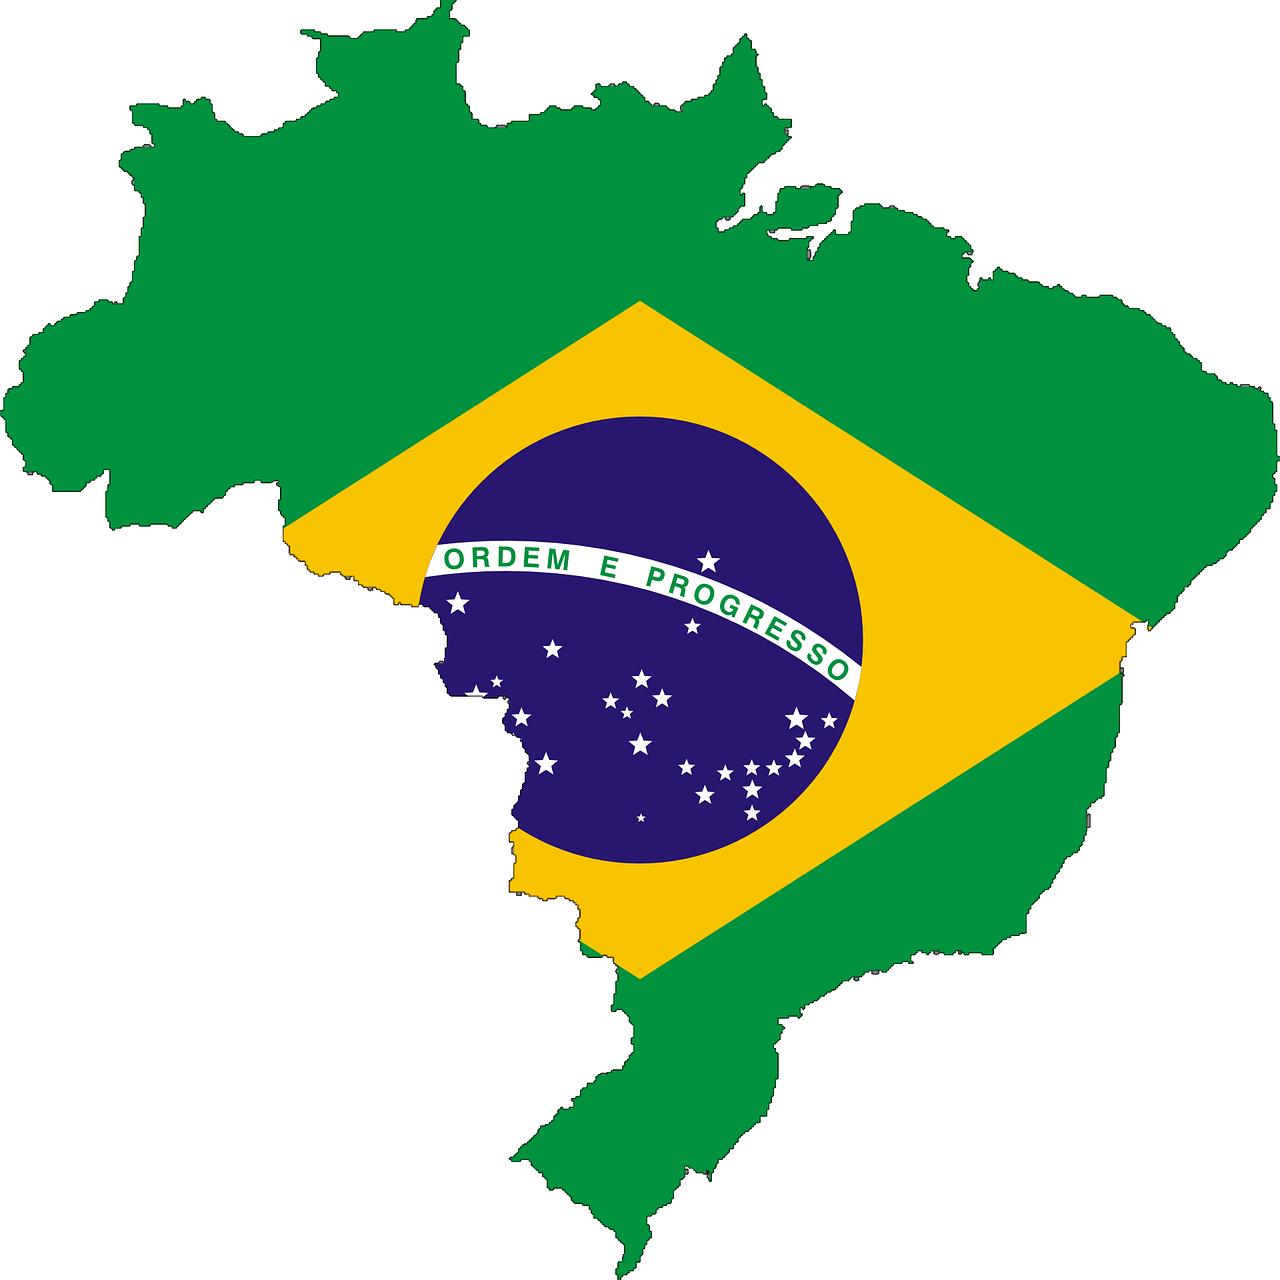 Celebrating our diversity! Brazil